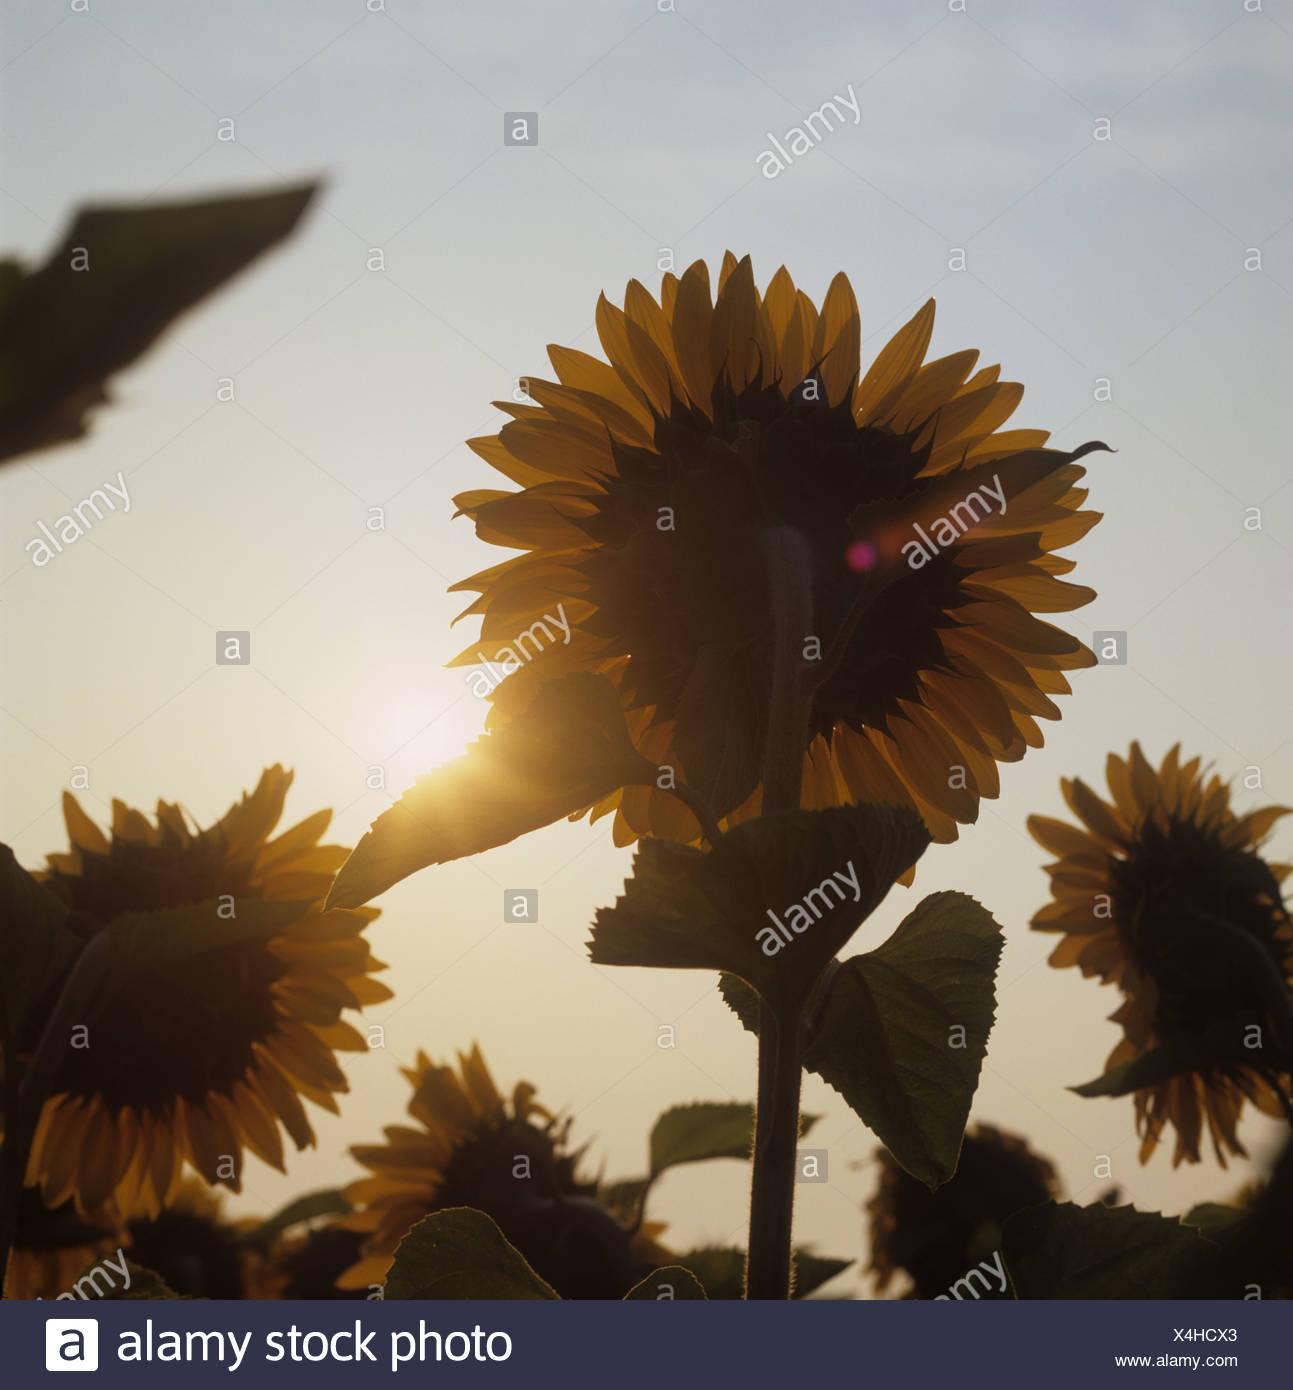 Sunflower flowers set against the orange colour of the rising sun France - Stock Image